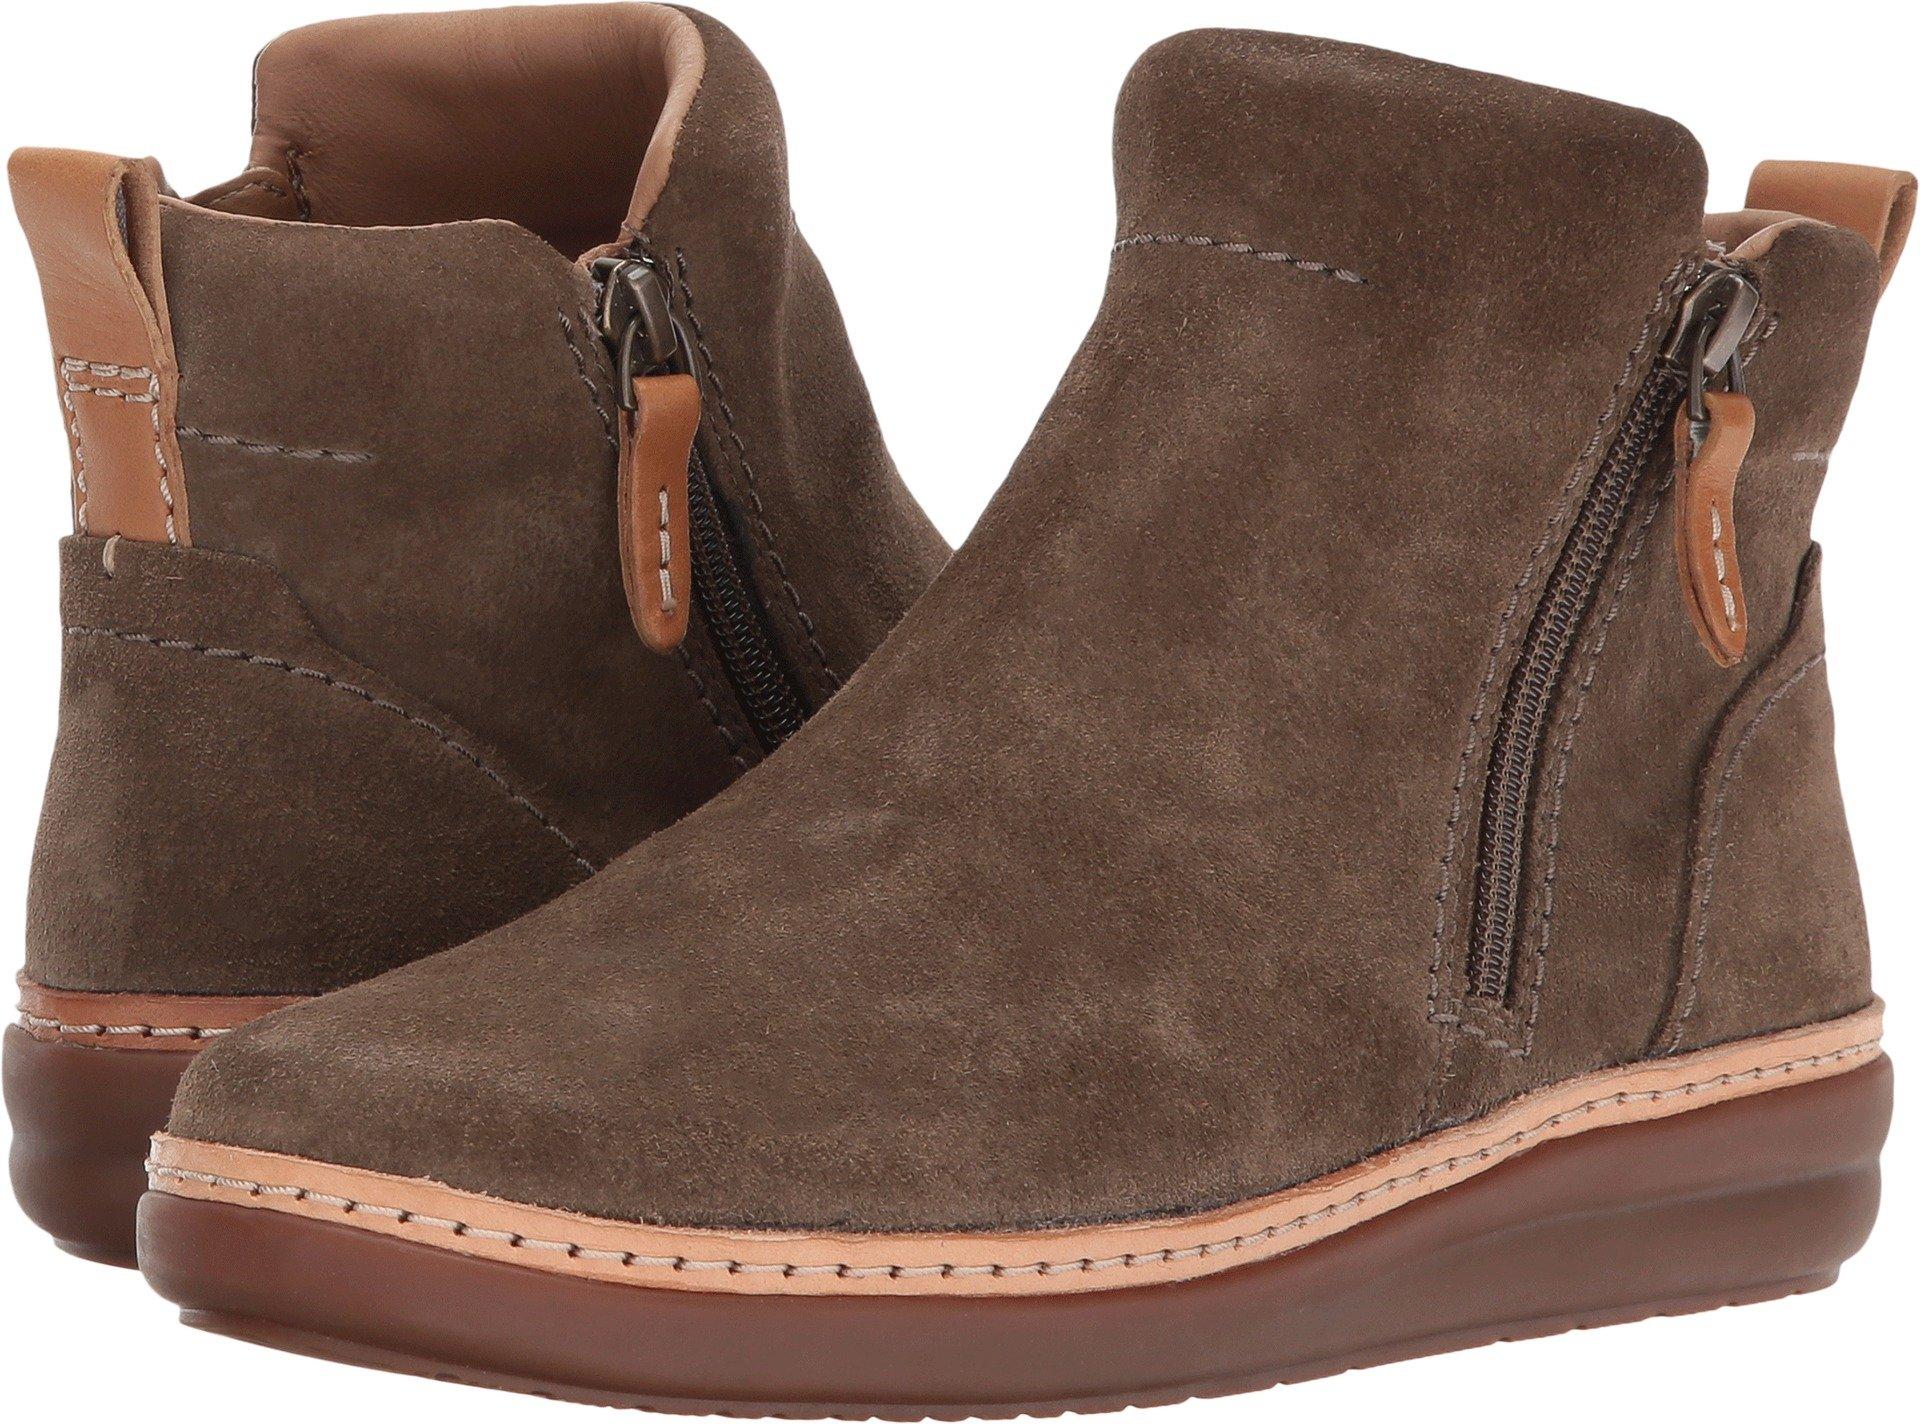 Clarks Women's Amberlee Rosi Olive Suede Shoe